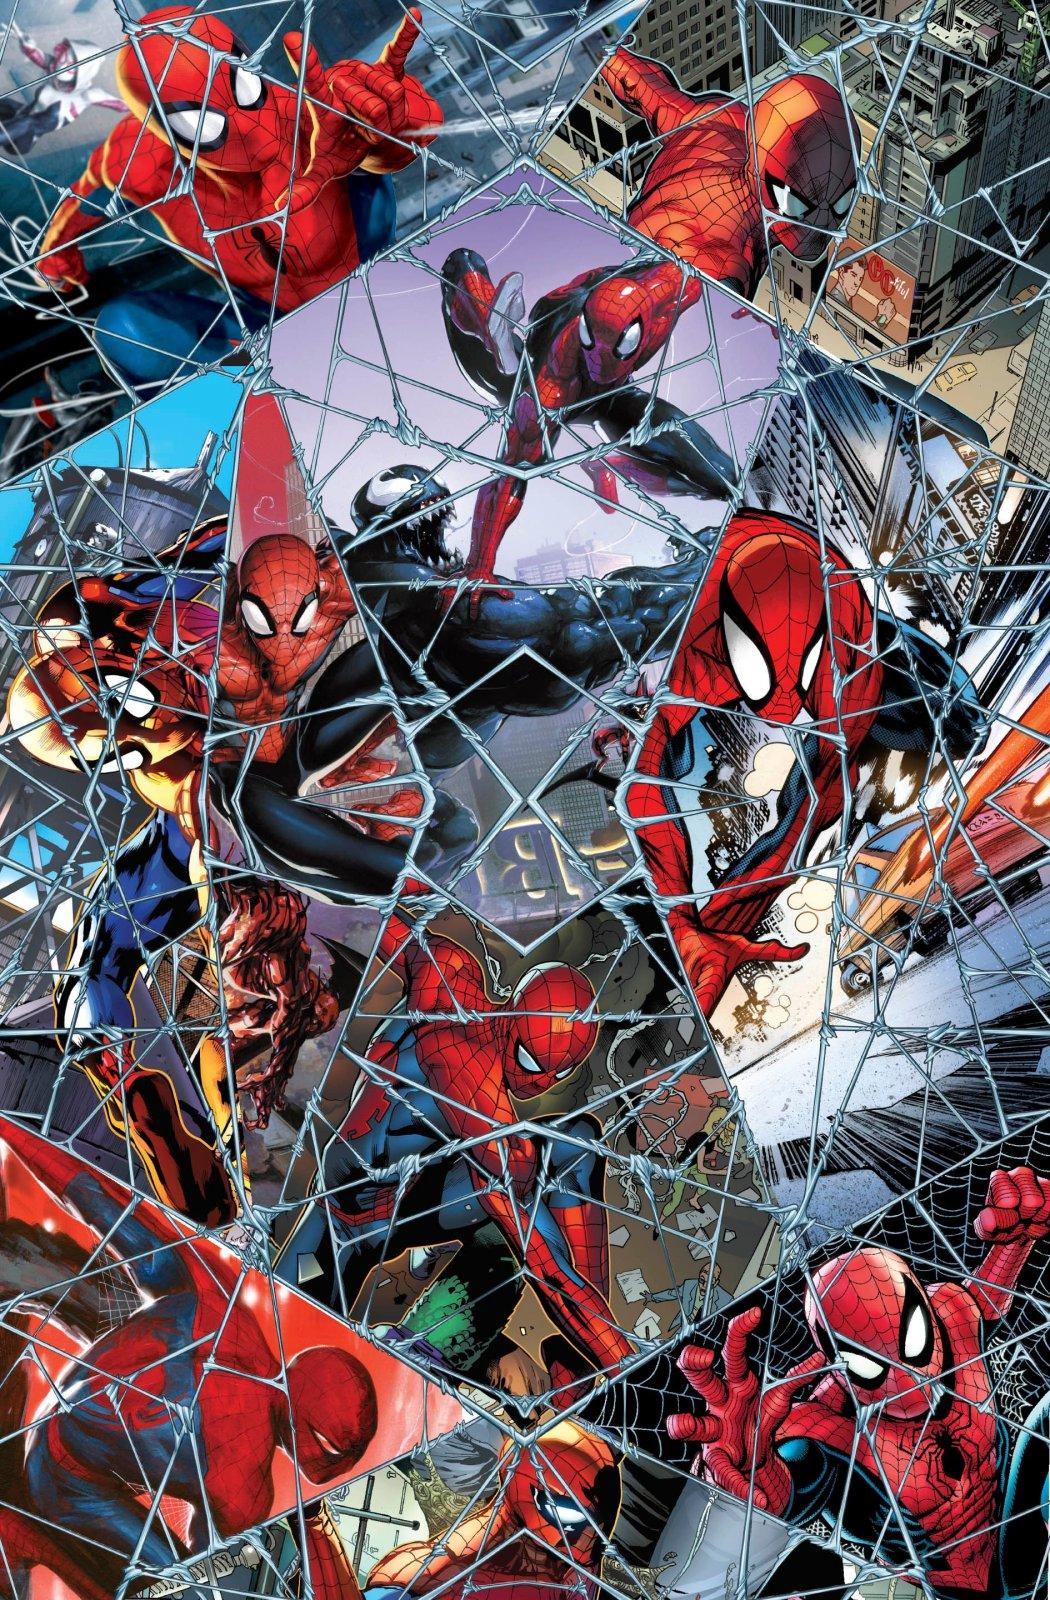 PROMO* SC-Marvel Spiderman Digital 71189-A620715 Marvel Spiderman Comic Web Mosaic